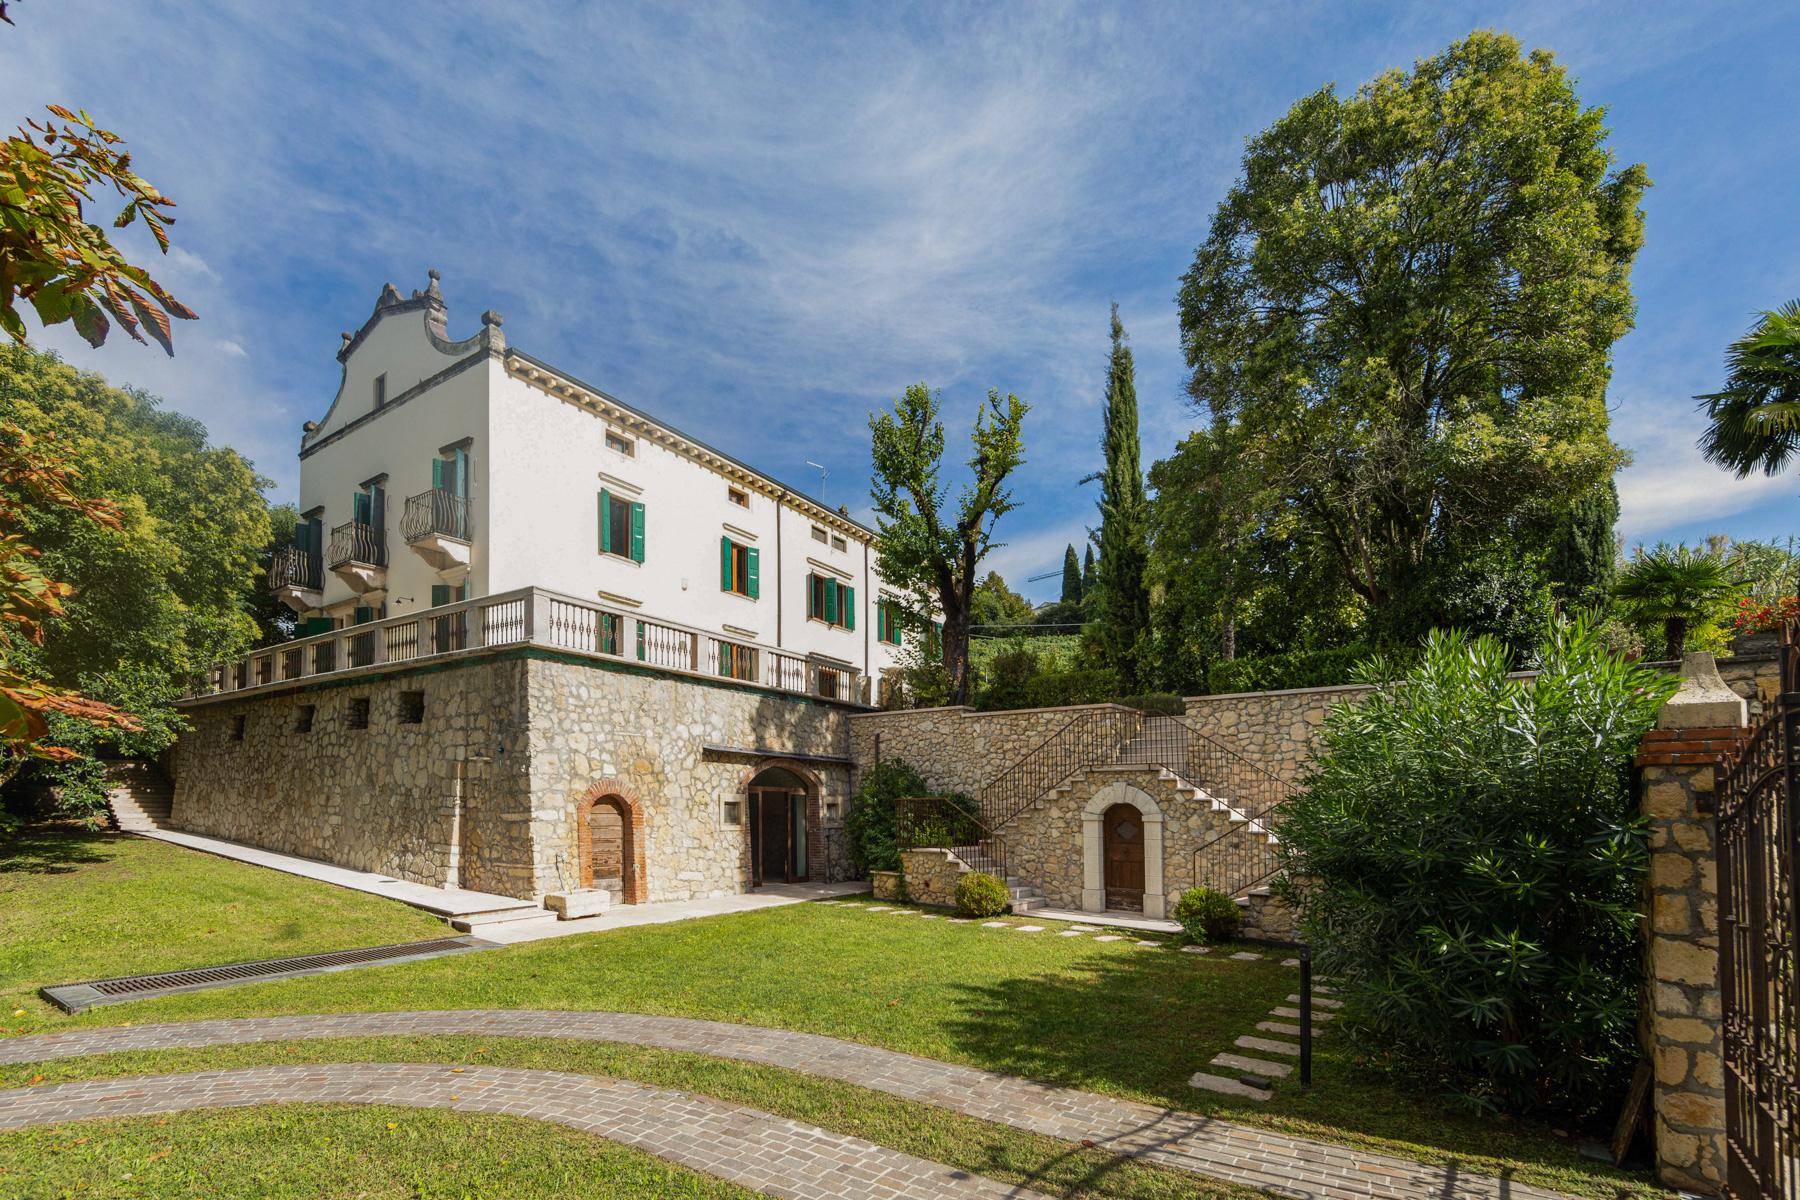 Villa in Vendita a Verona corso cavour